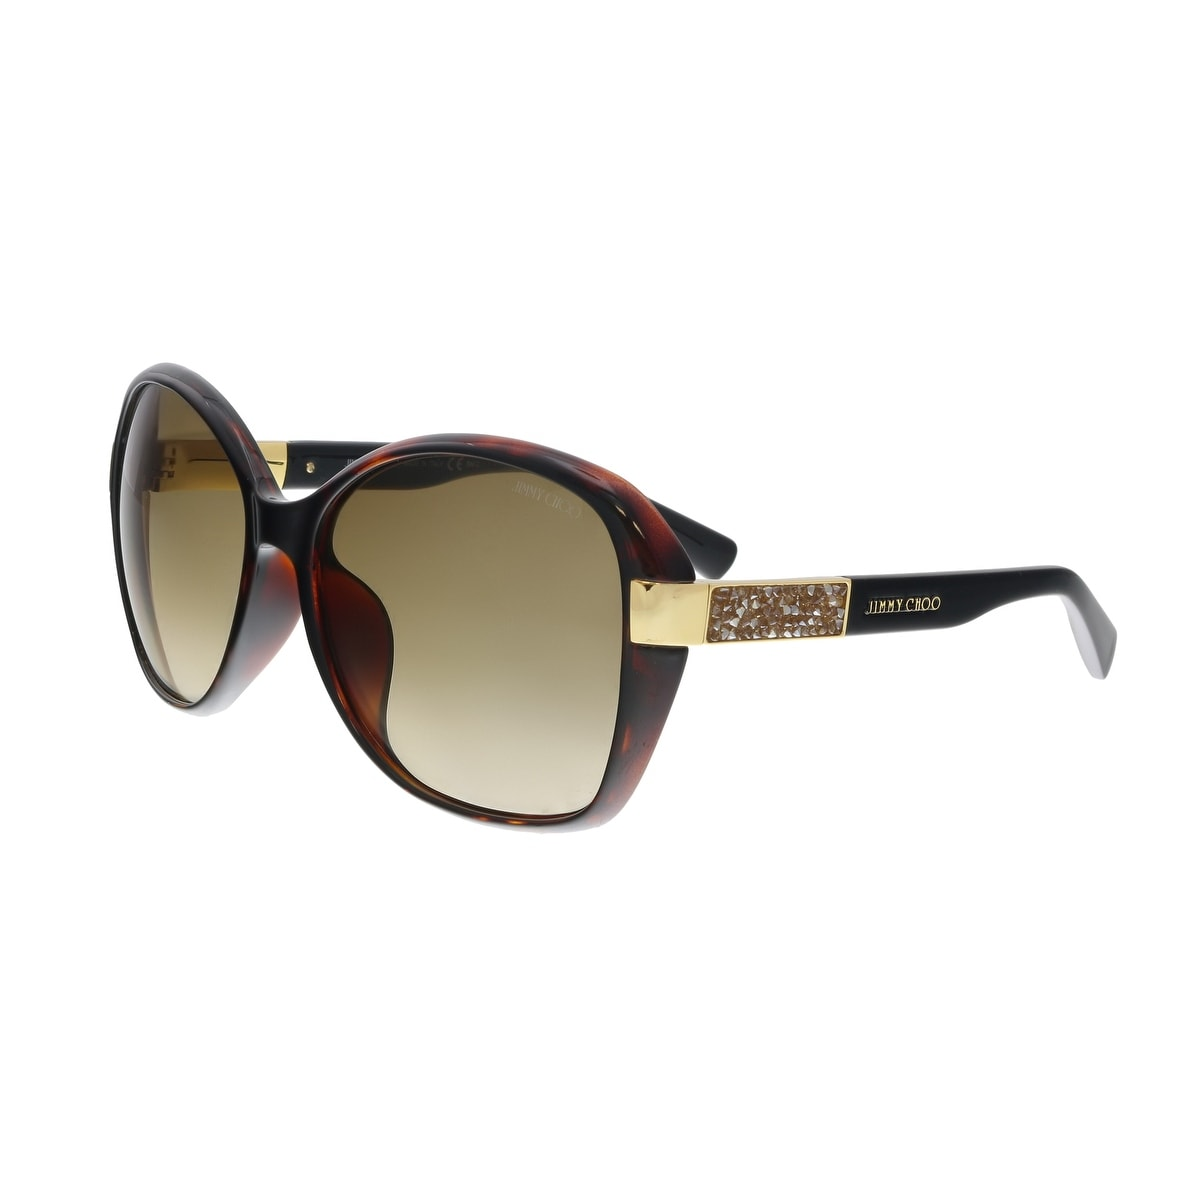 050dac910e44 Jimmy Choo Sunglasses